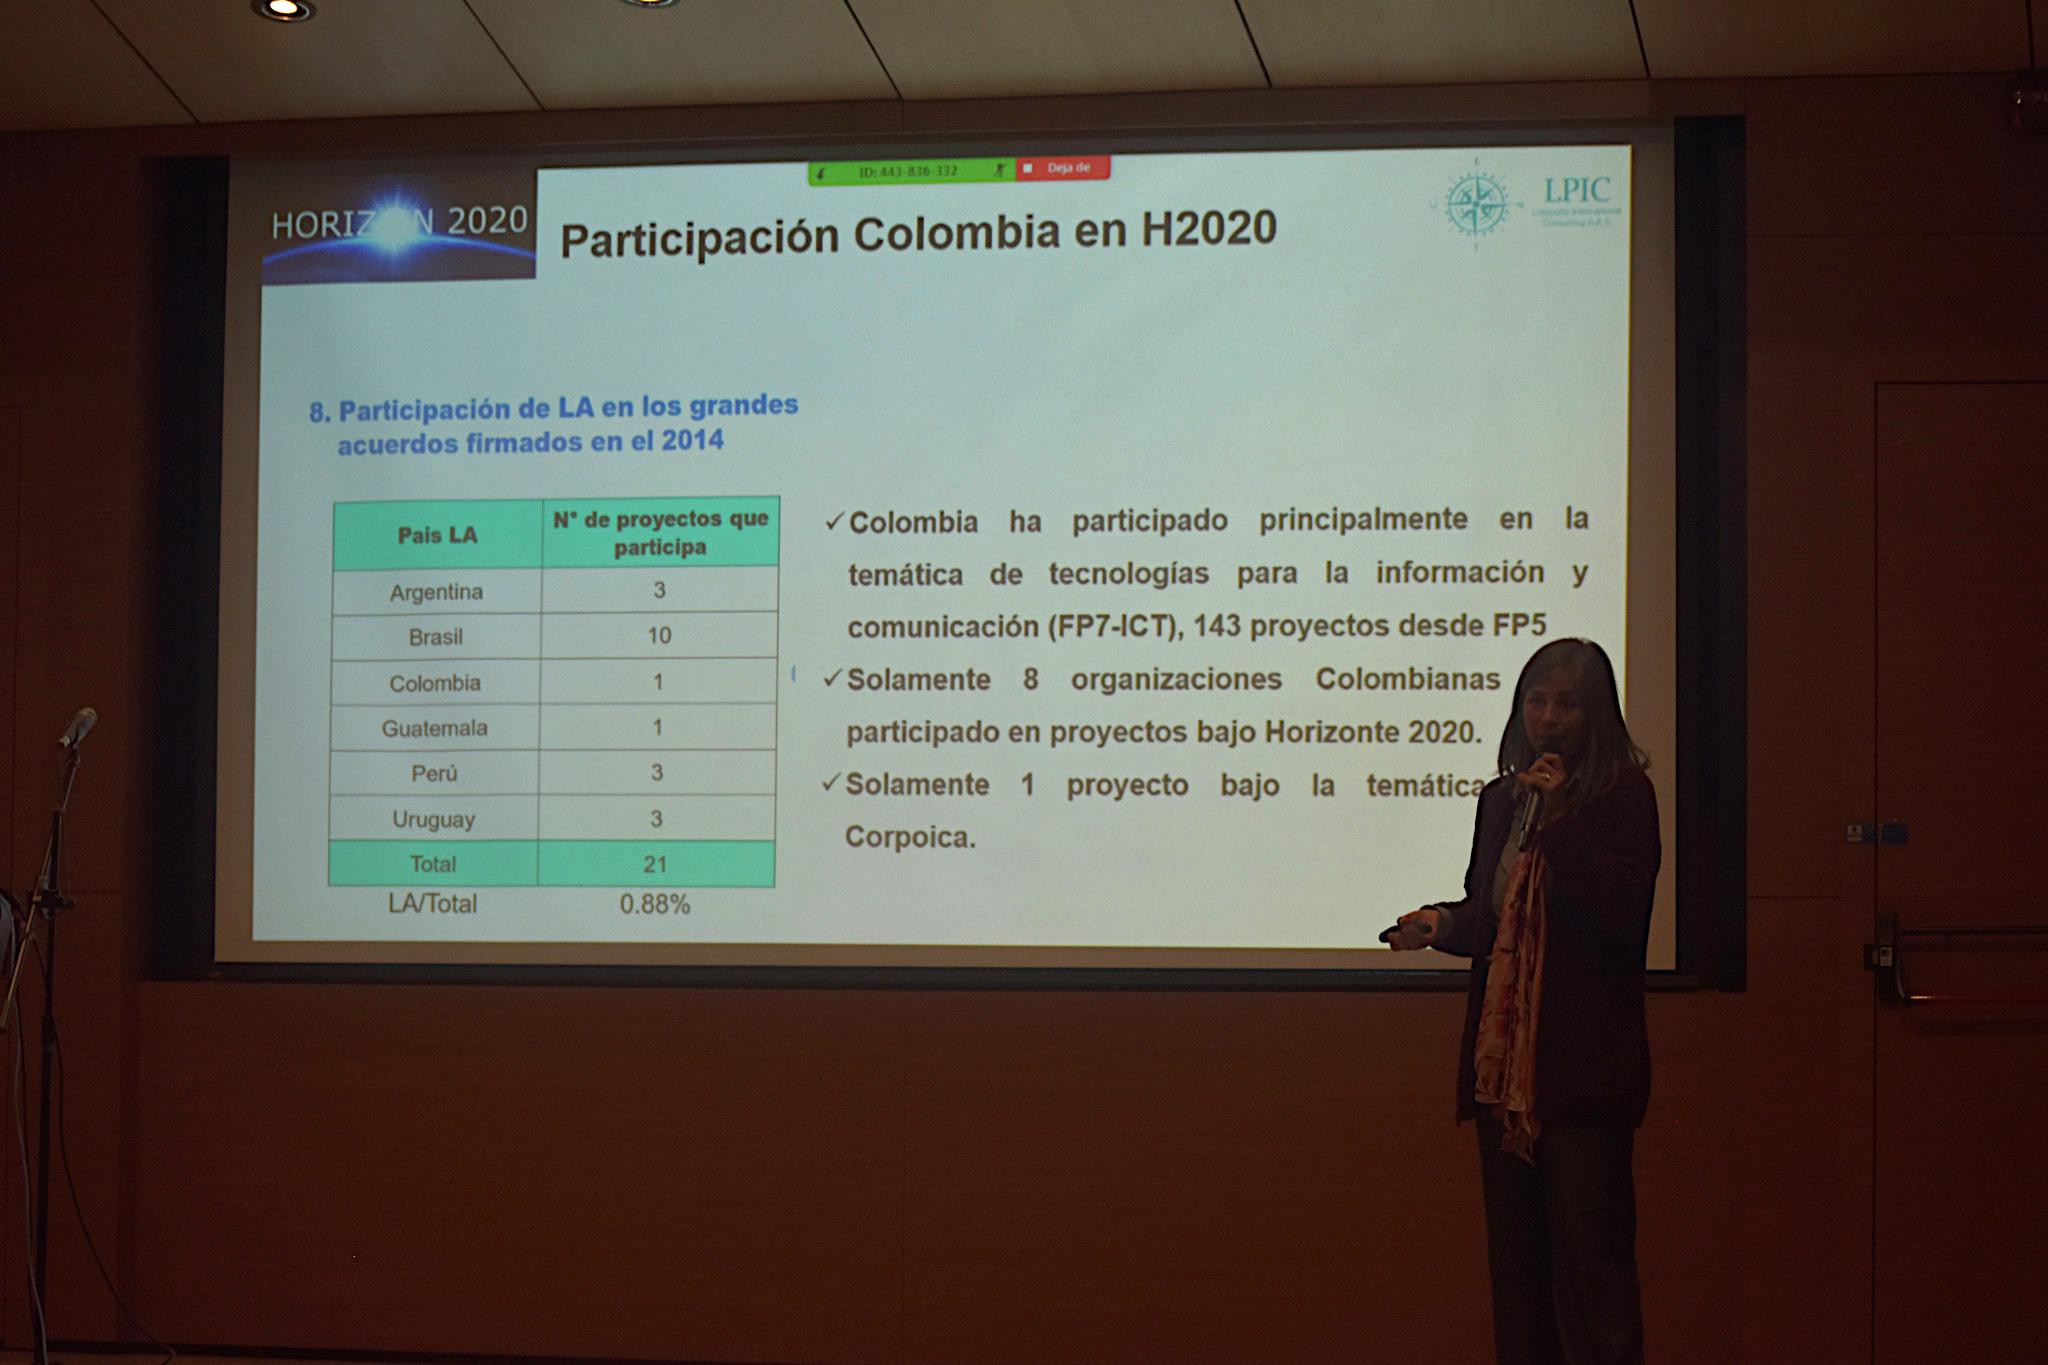 Lida Rodríguez, de Lidapatty International Consulting S.A.S. (Foto: Vicerrectoría de Investigación)